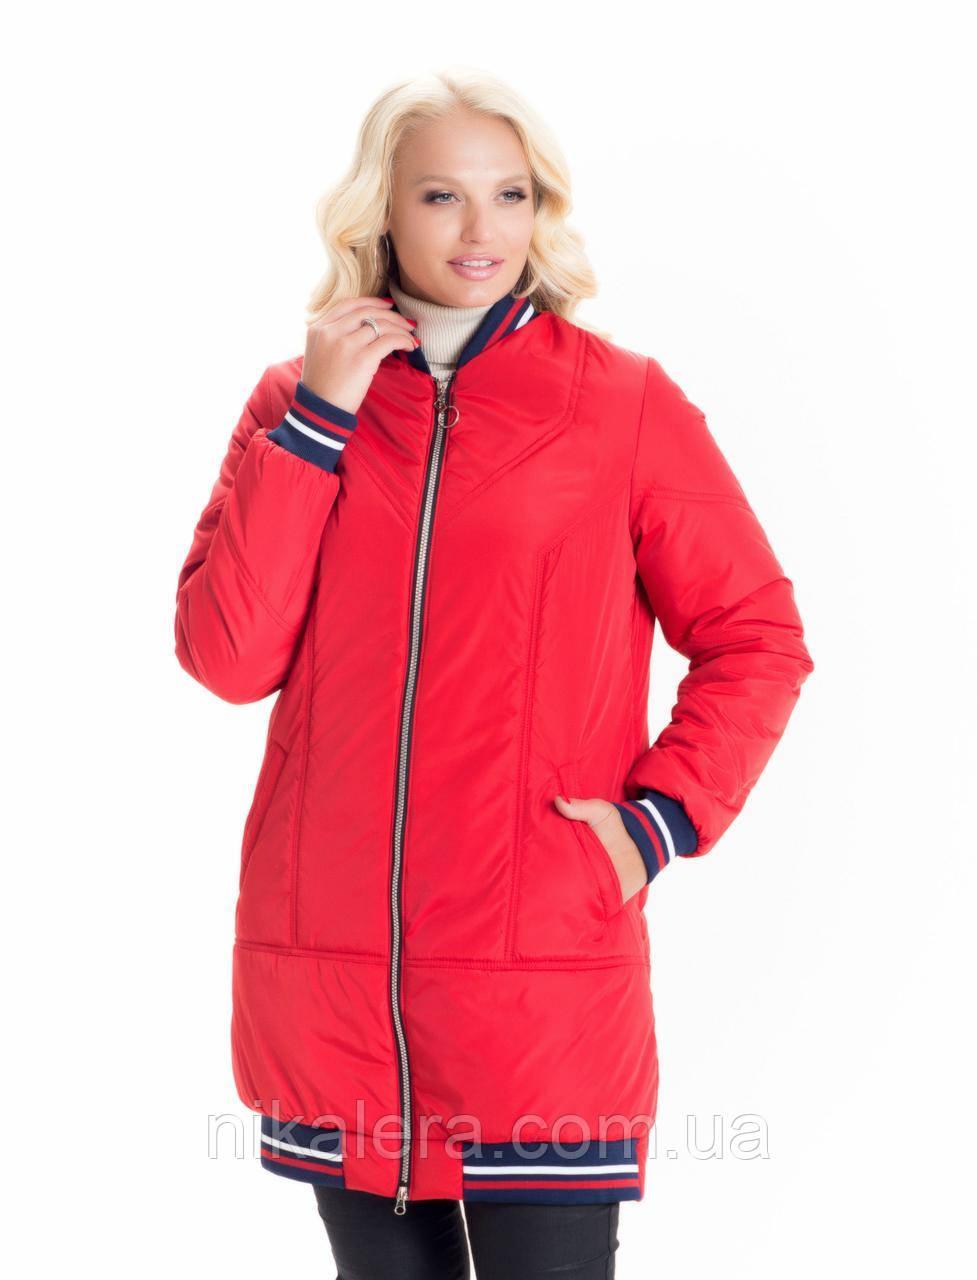 Демисезонная куртка-бомбер свободного стиля  рр 42-56